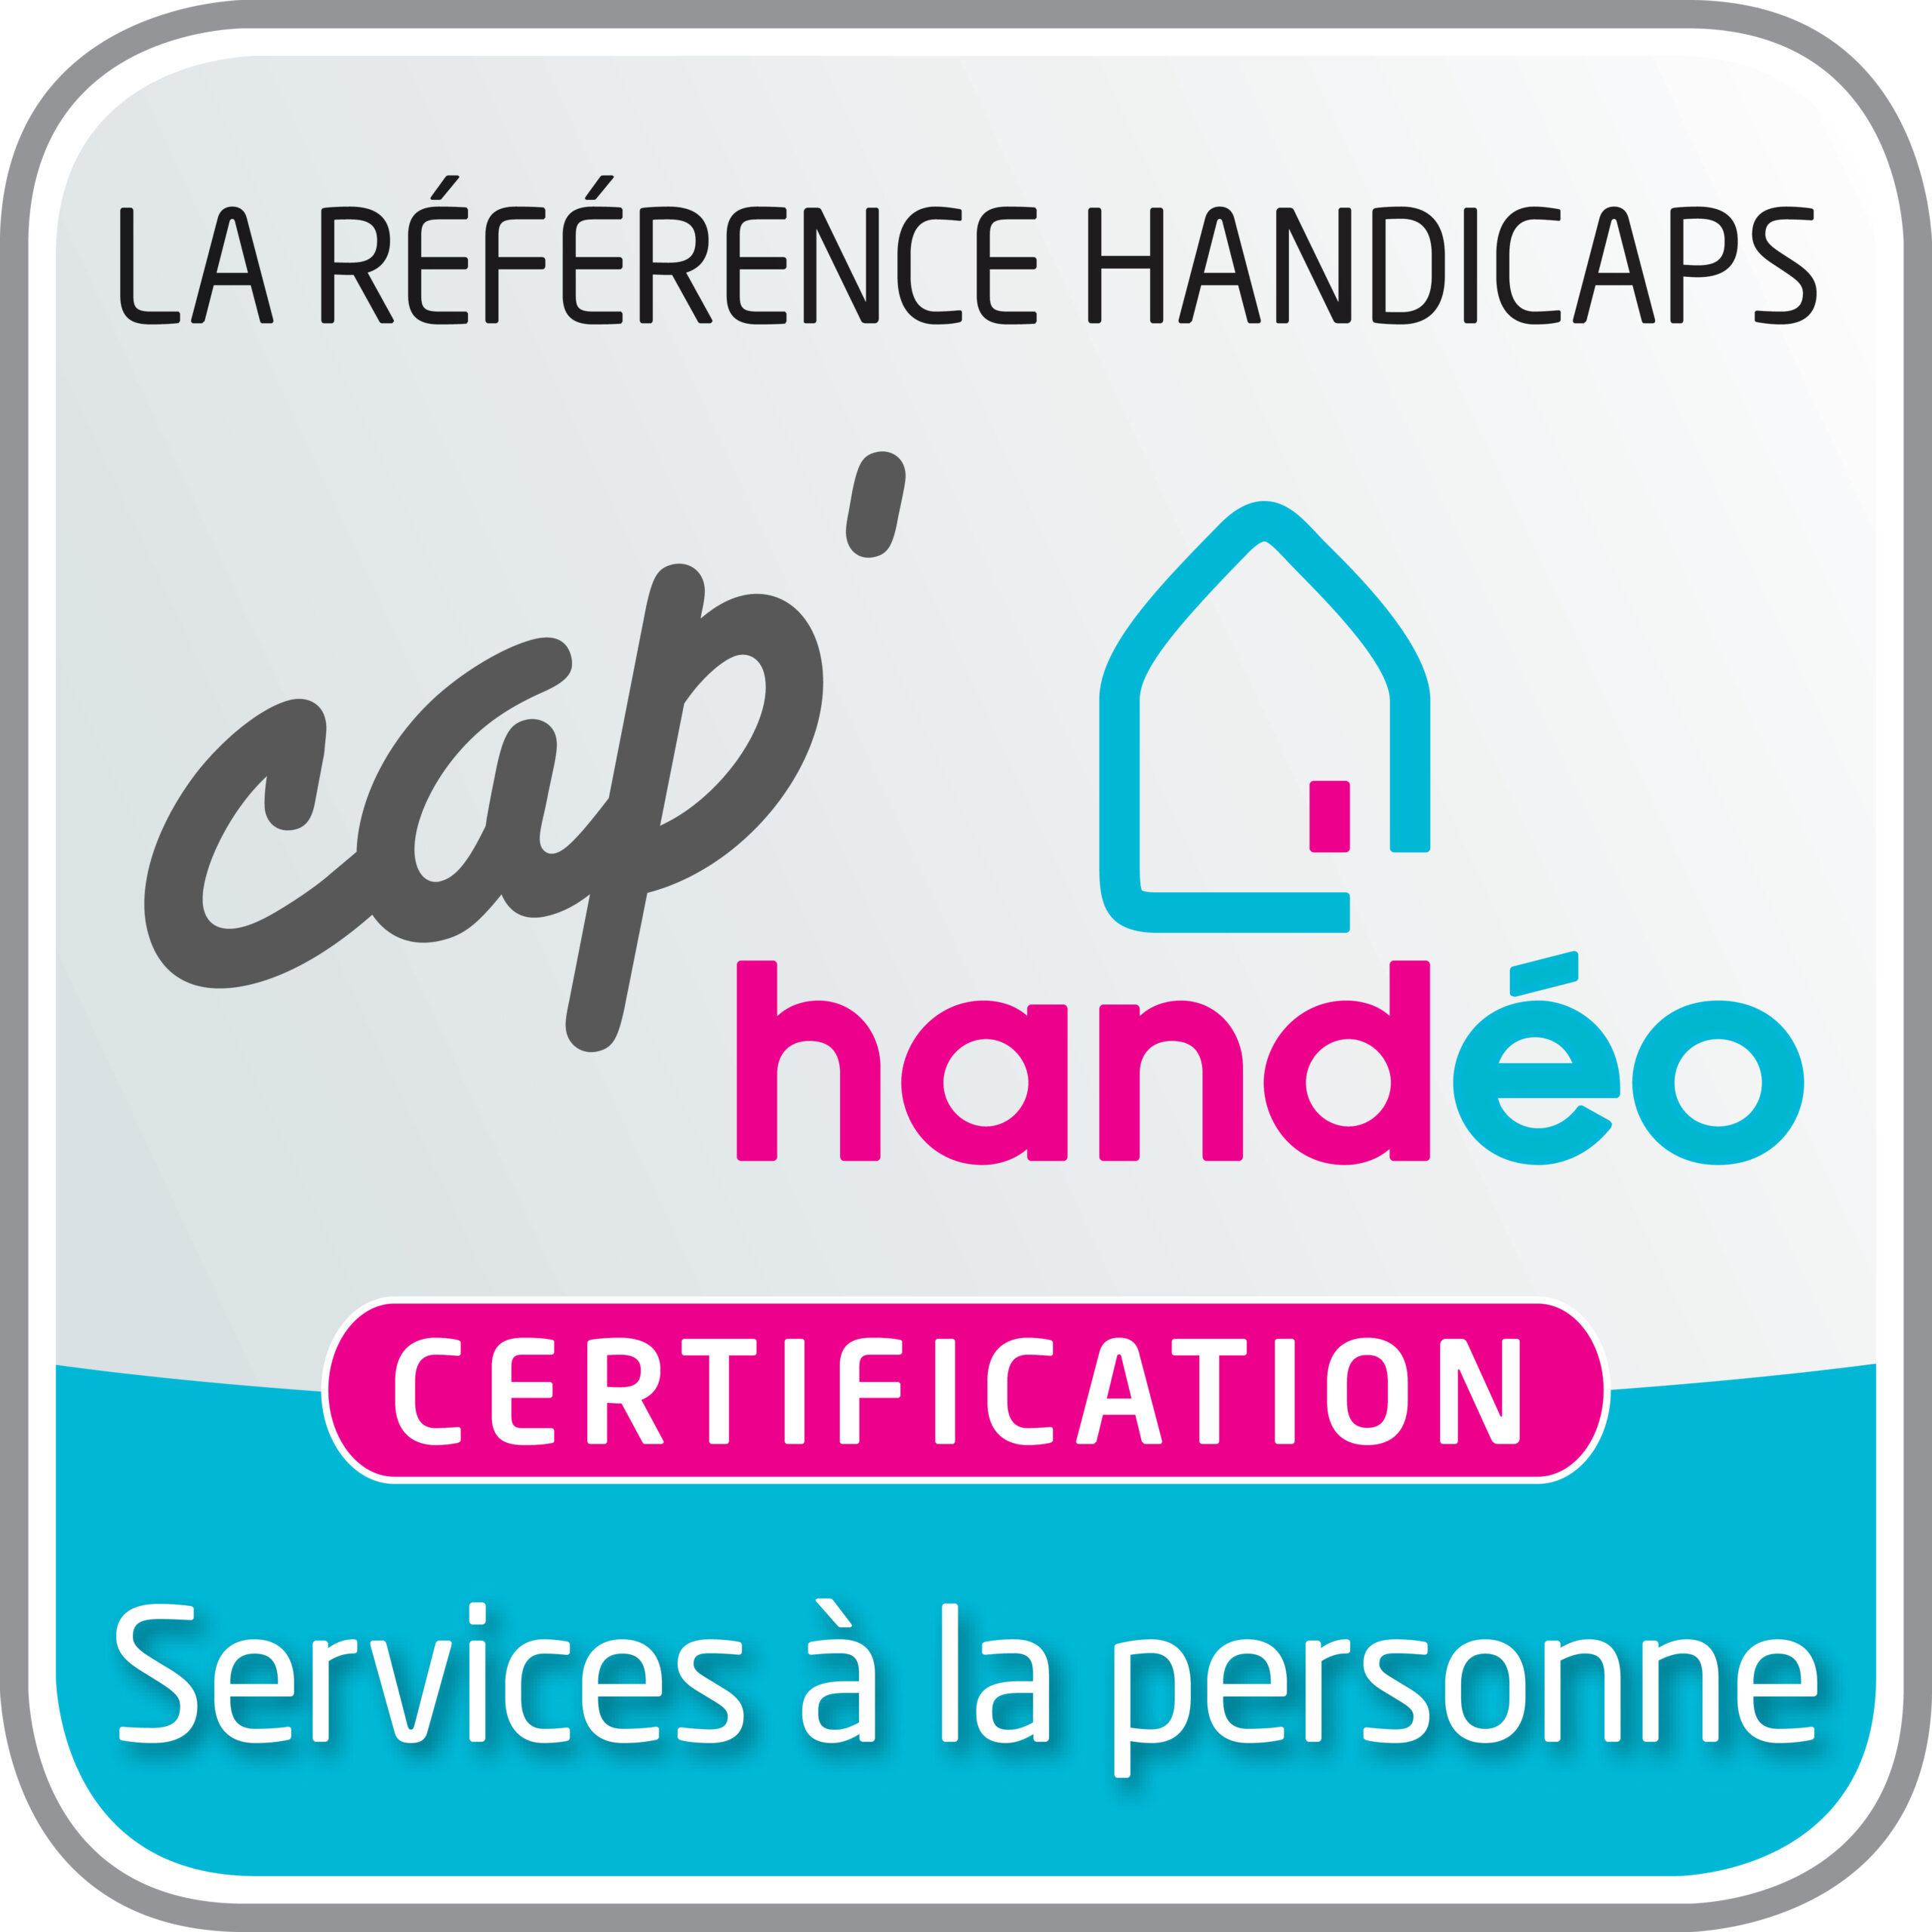 CSAP_Logo_CapHandeo_SAP-Certification_WBE_RVB_HD-scaled